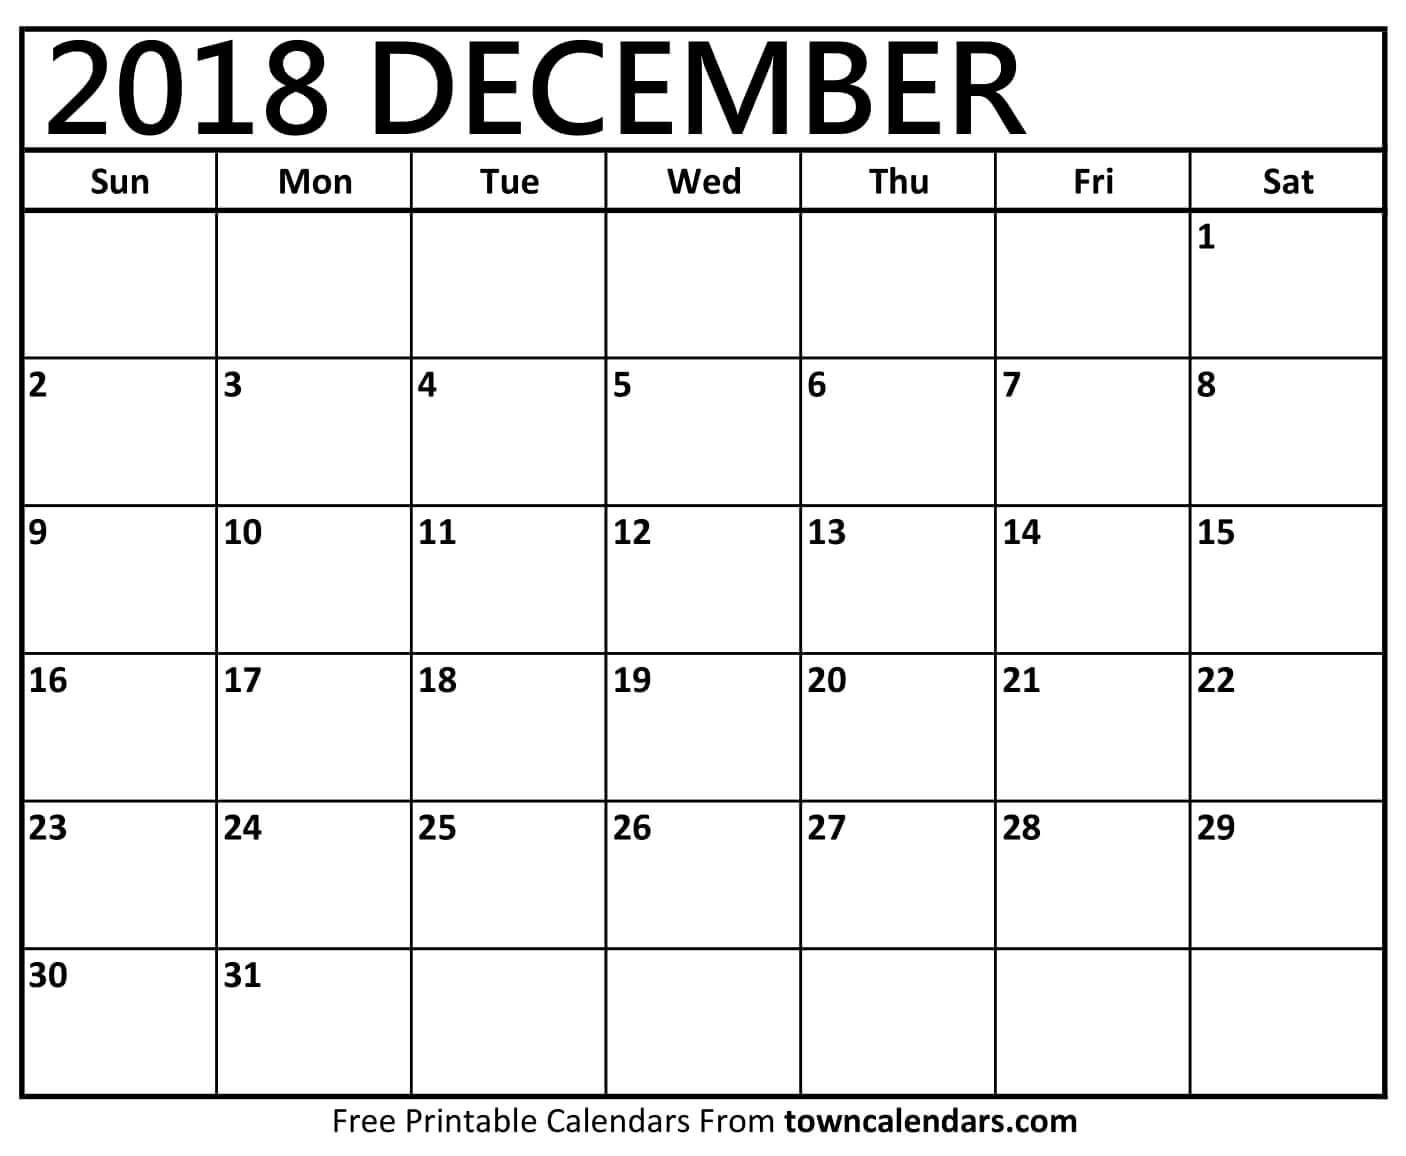 Printable December 2018 Calendar - Towncalendars intended for Christmas Themed Calendar Templates